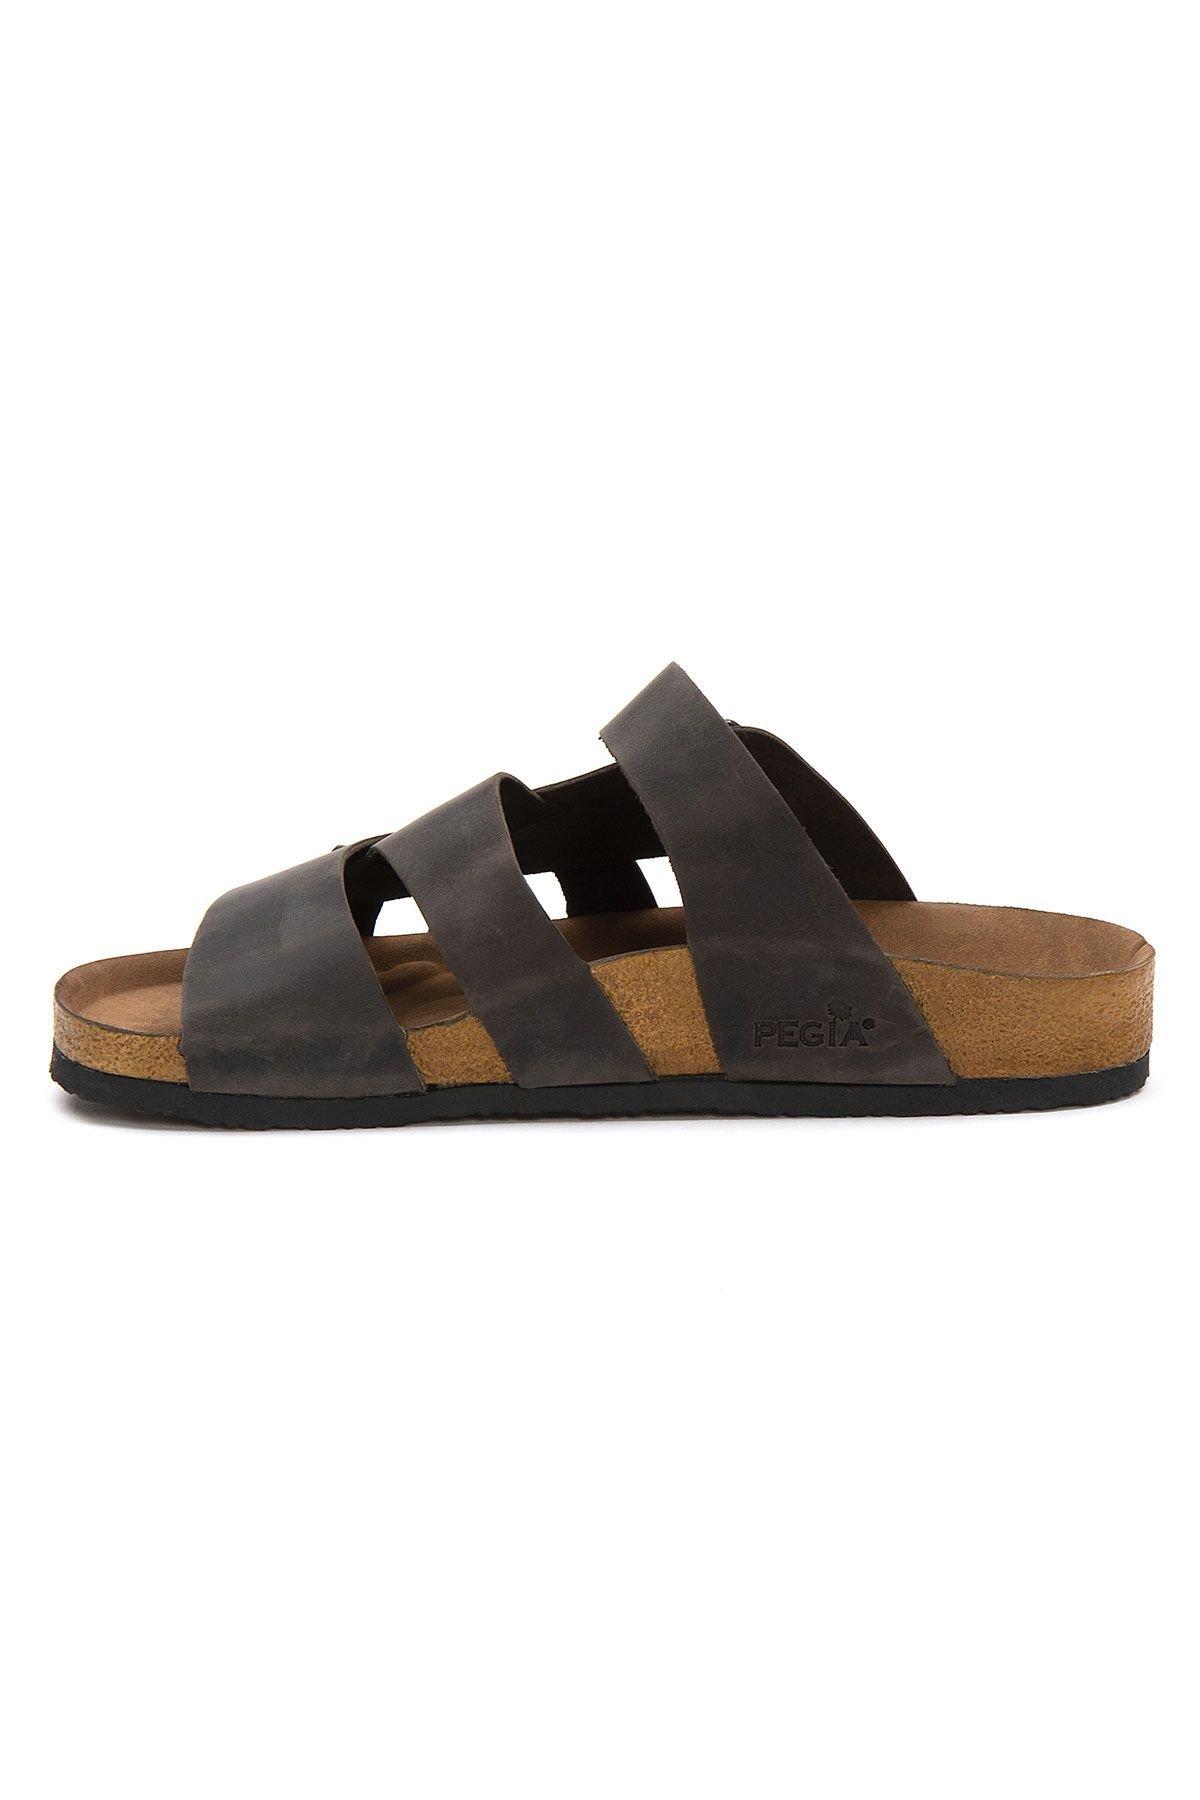 Pegia Men's Genuine Leather Slippers 215026 Anthracite-colored